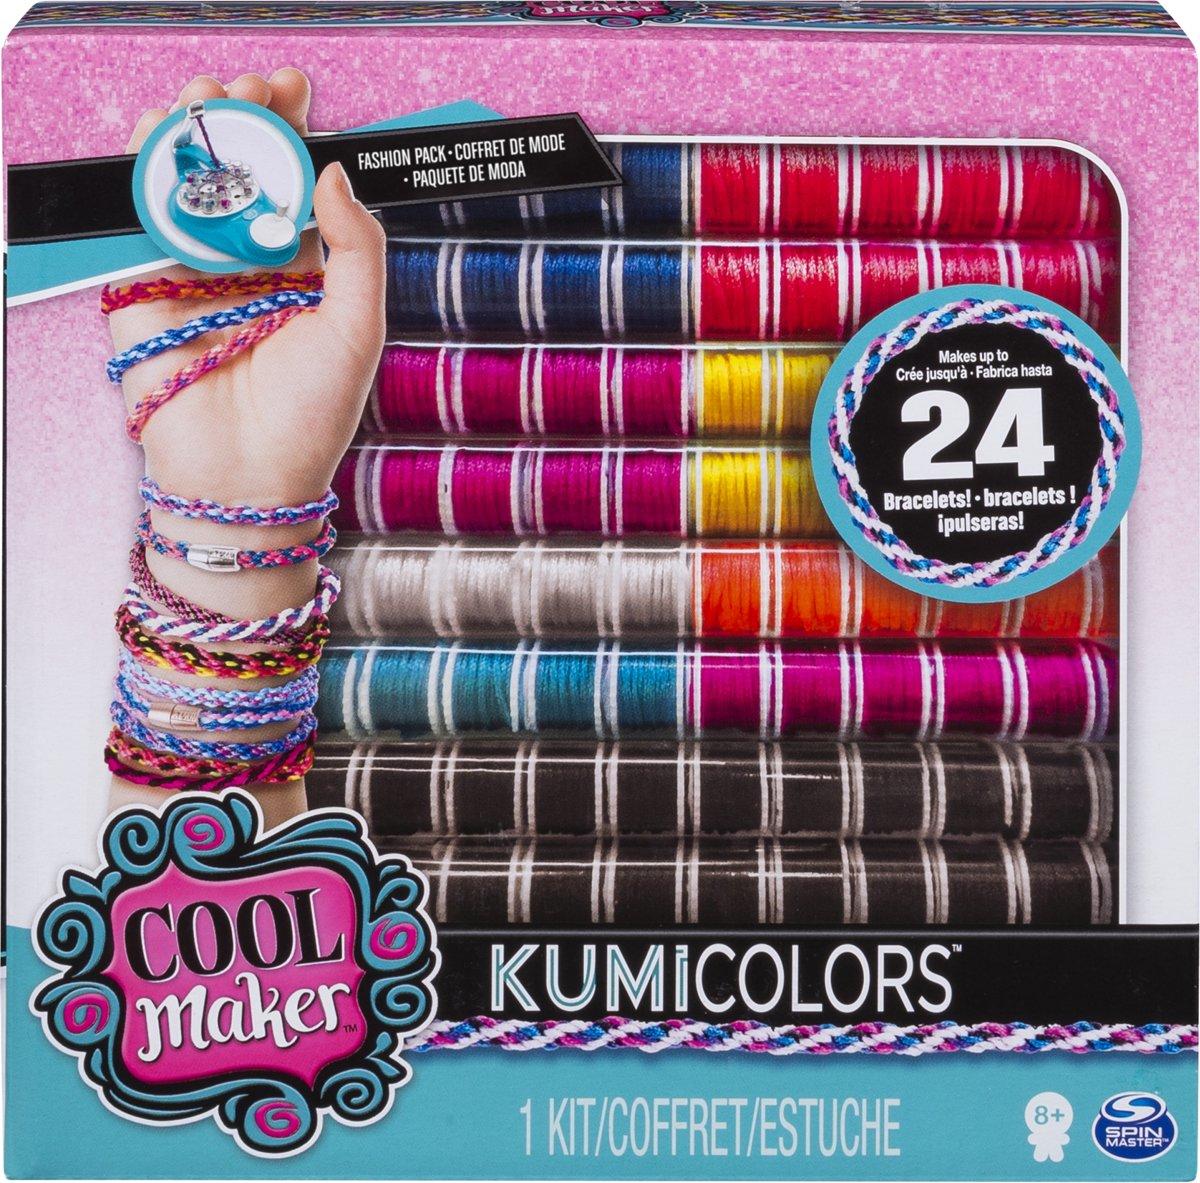 Fashion Packs - KumiFantasy + KumiNeons